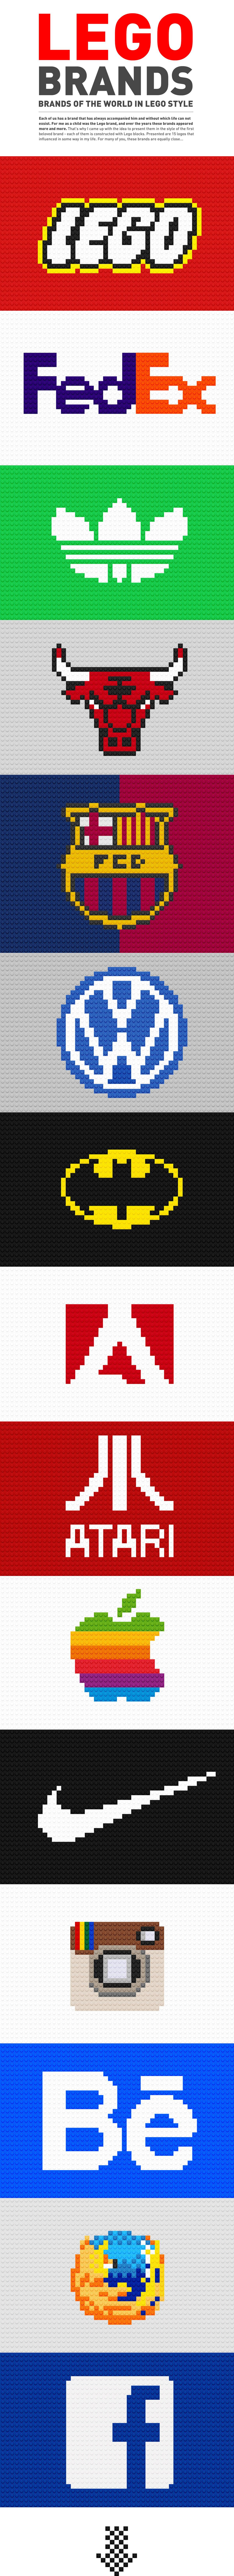 Lego-brands